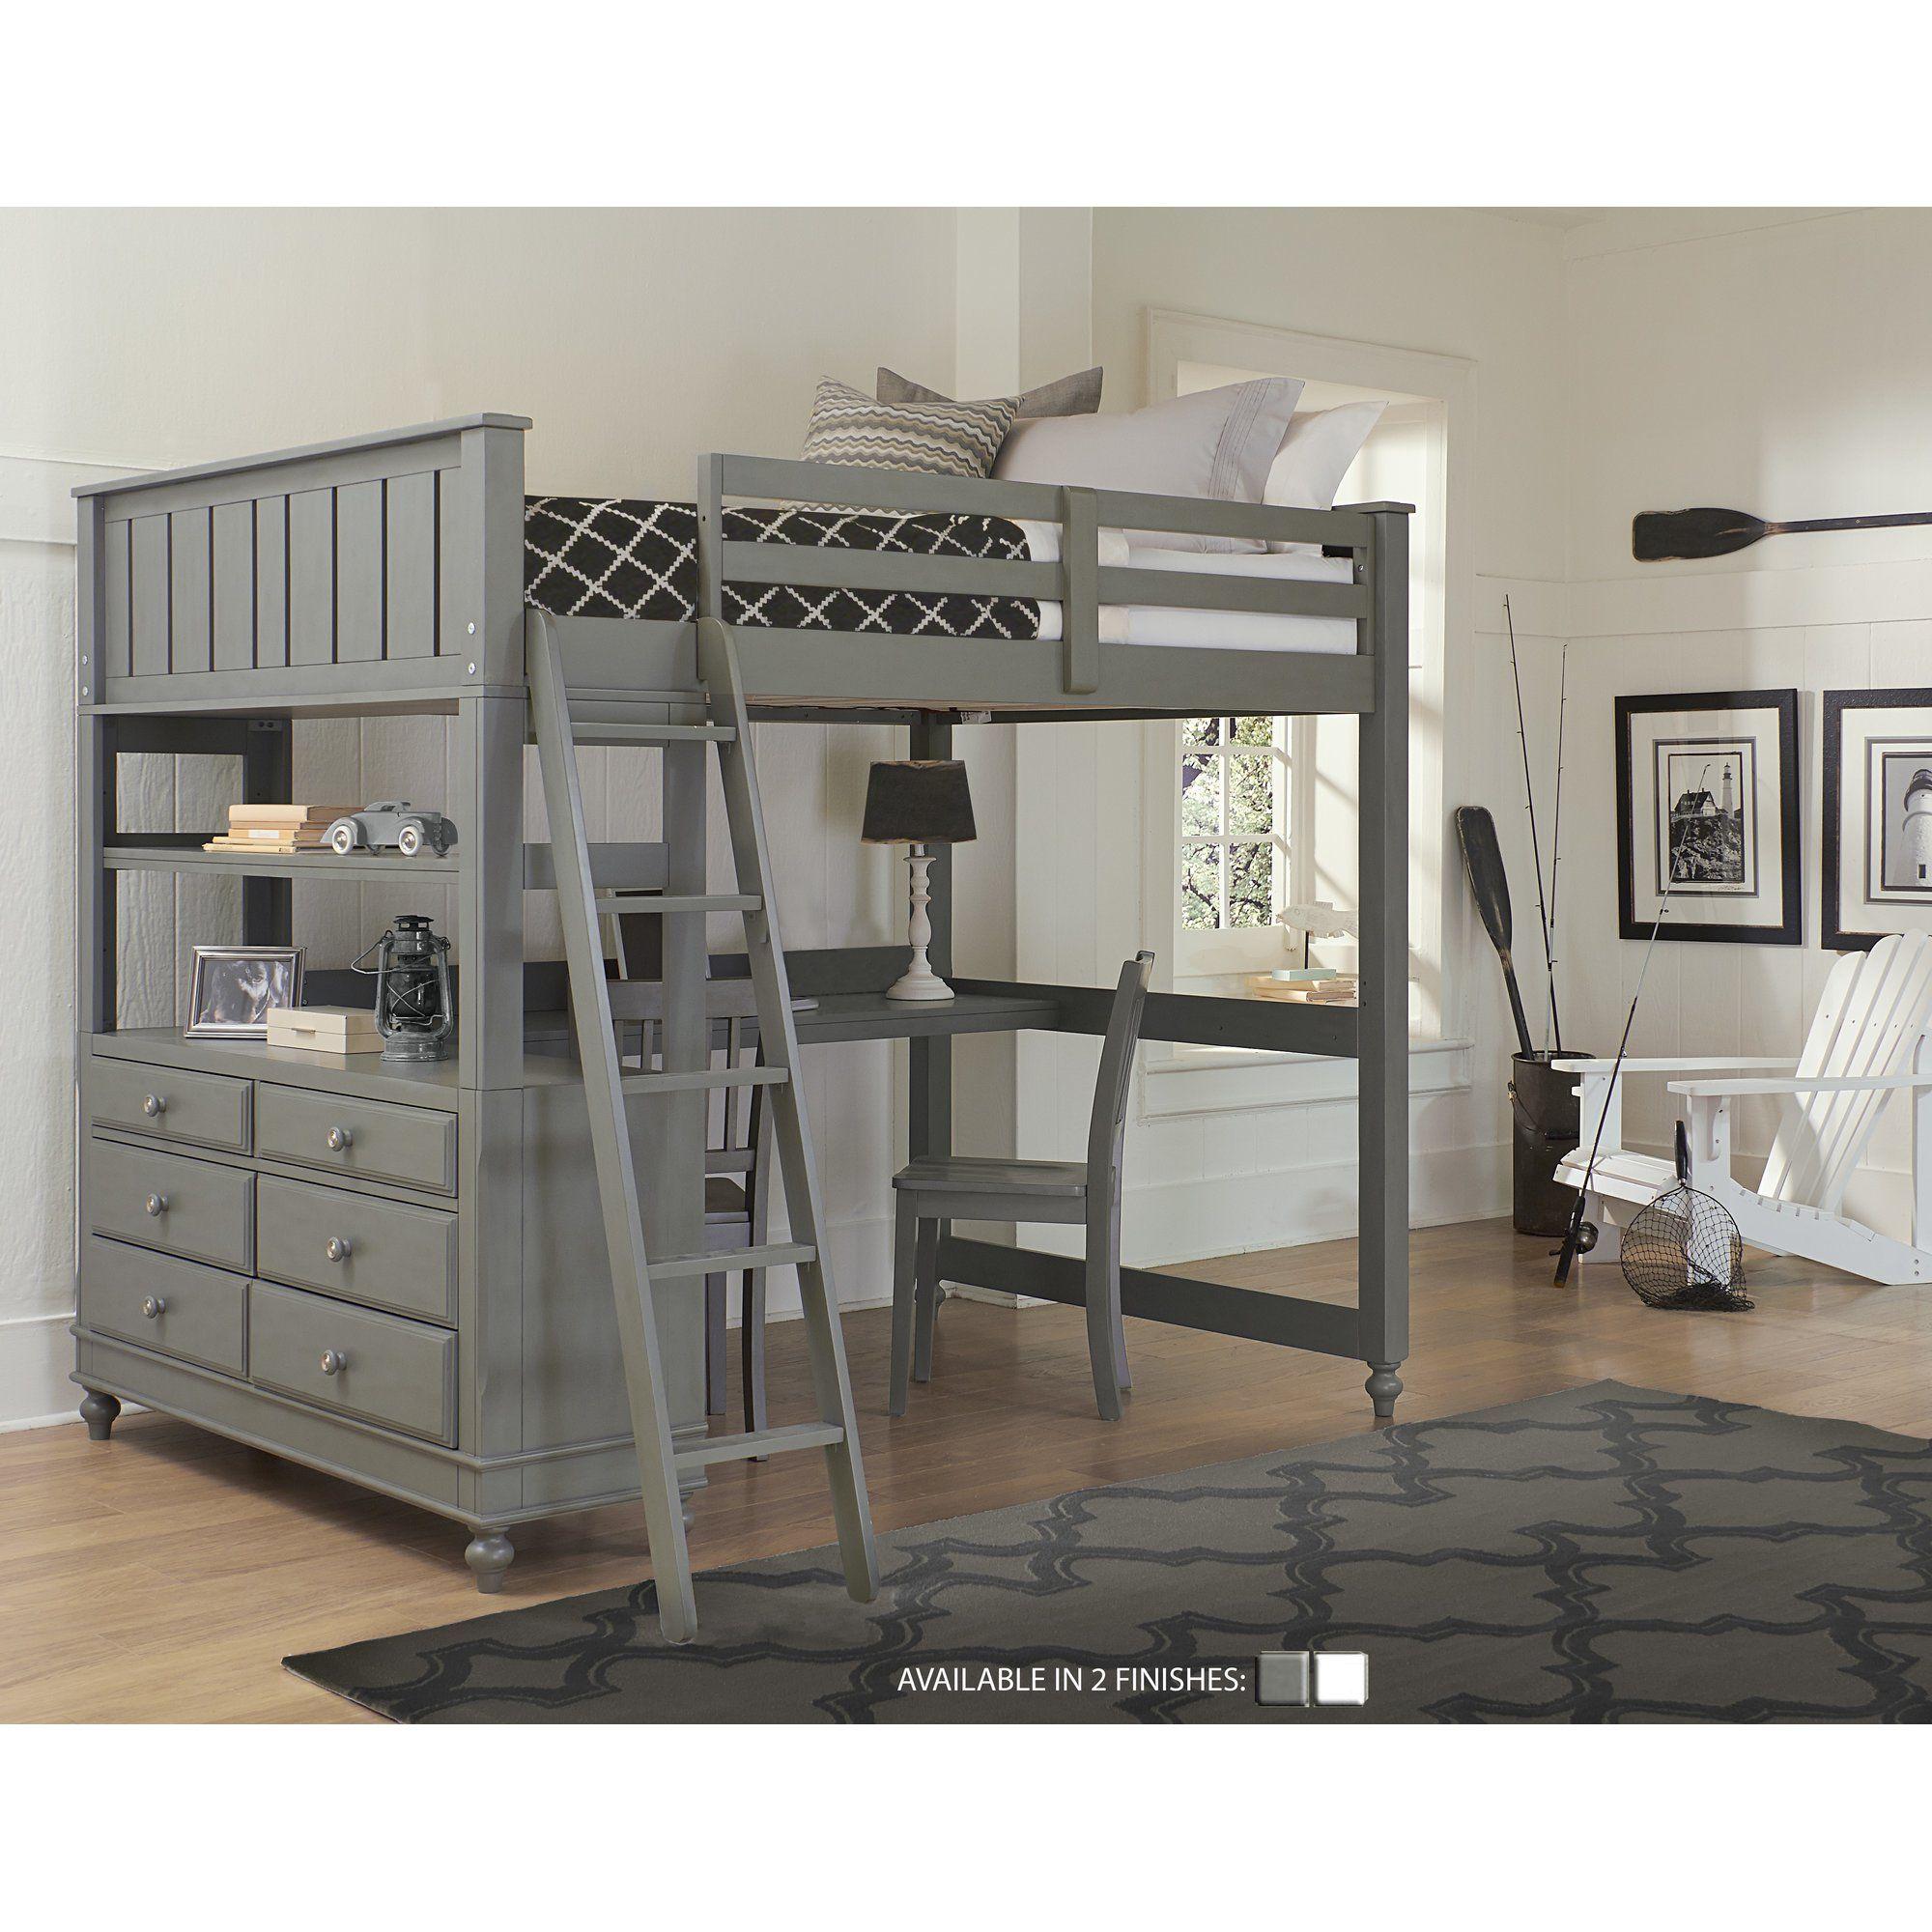 3 bedroom loft  Viv  Rae Jaime Lake House  Piece Loft Bed Set u Reviews  Wayfair